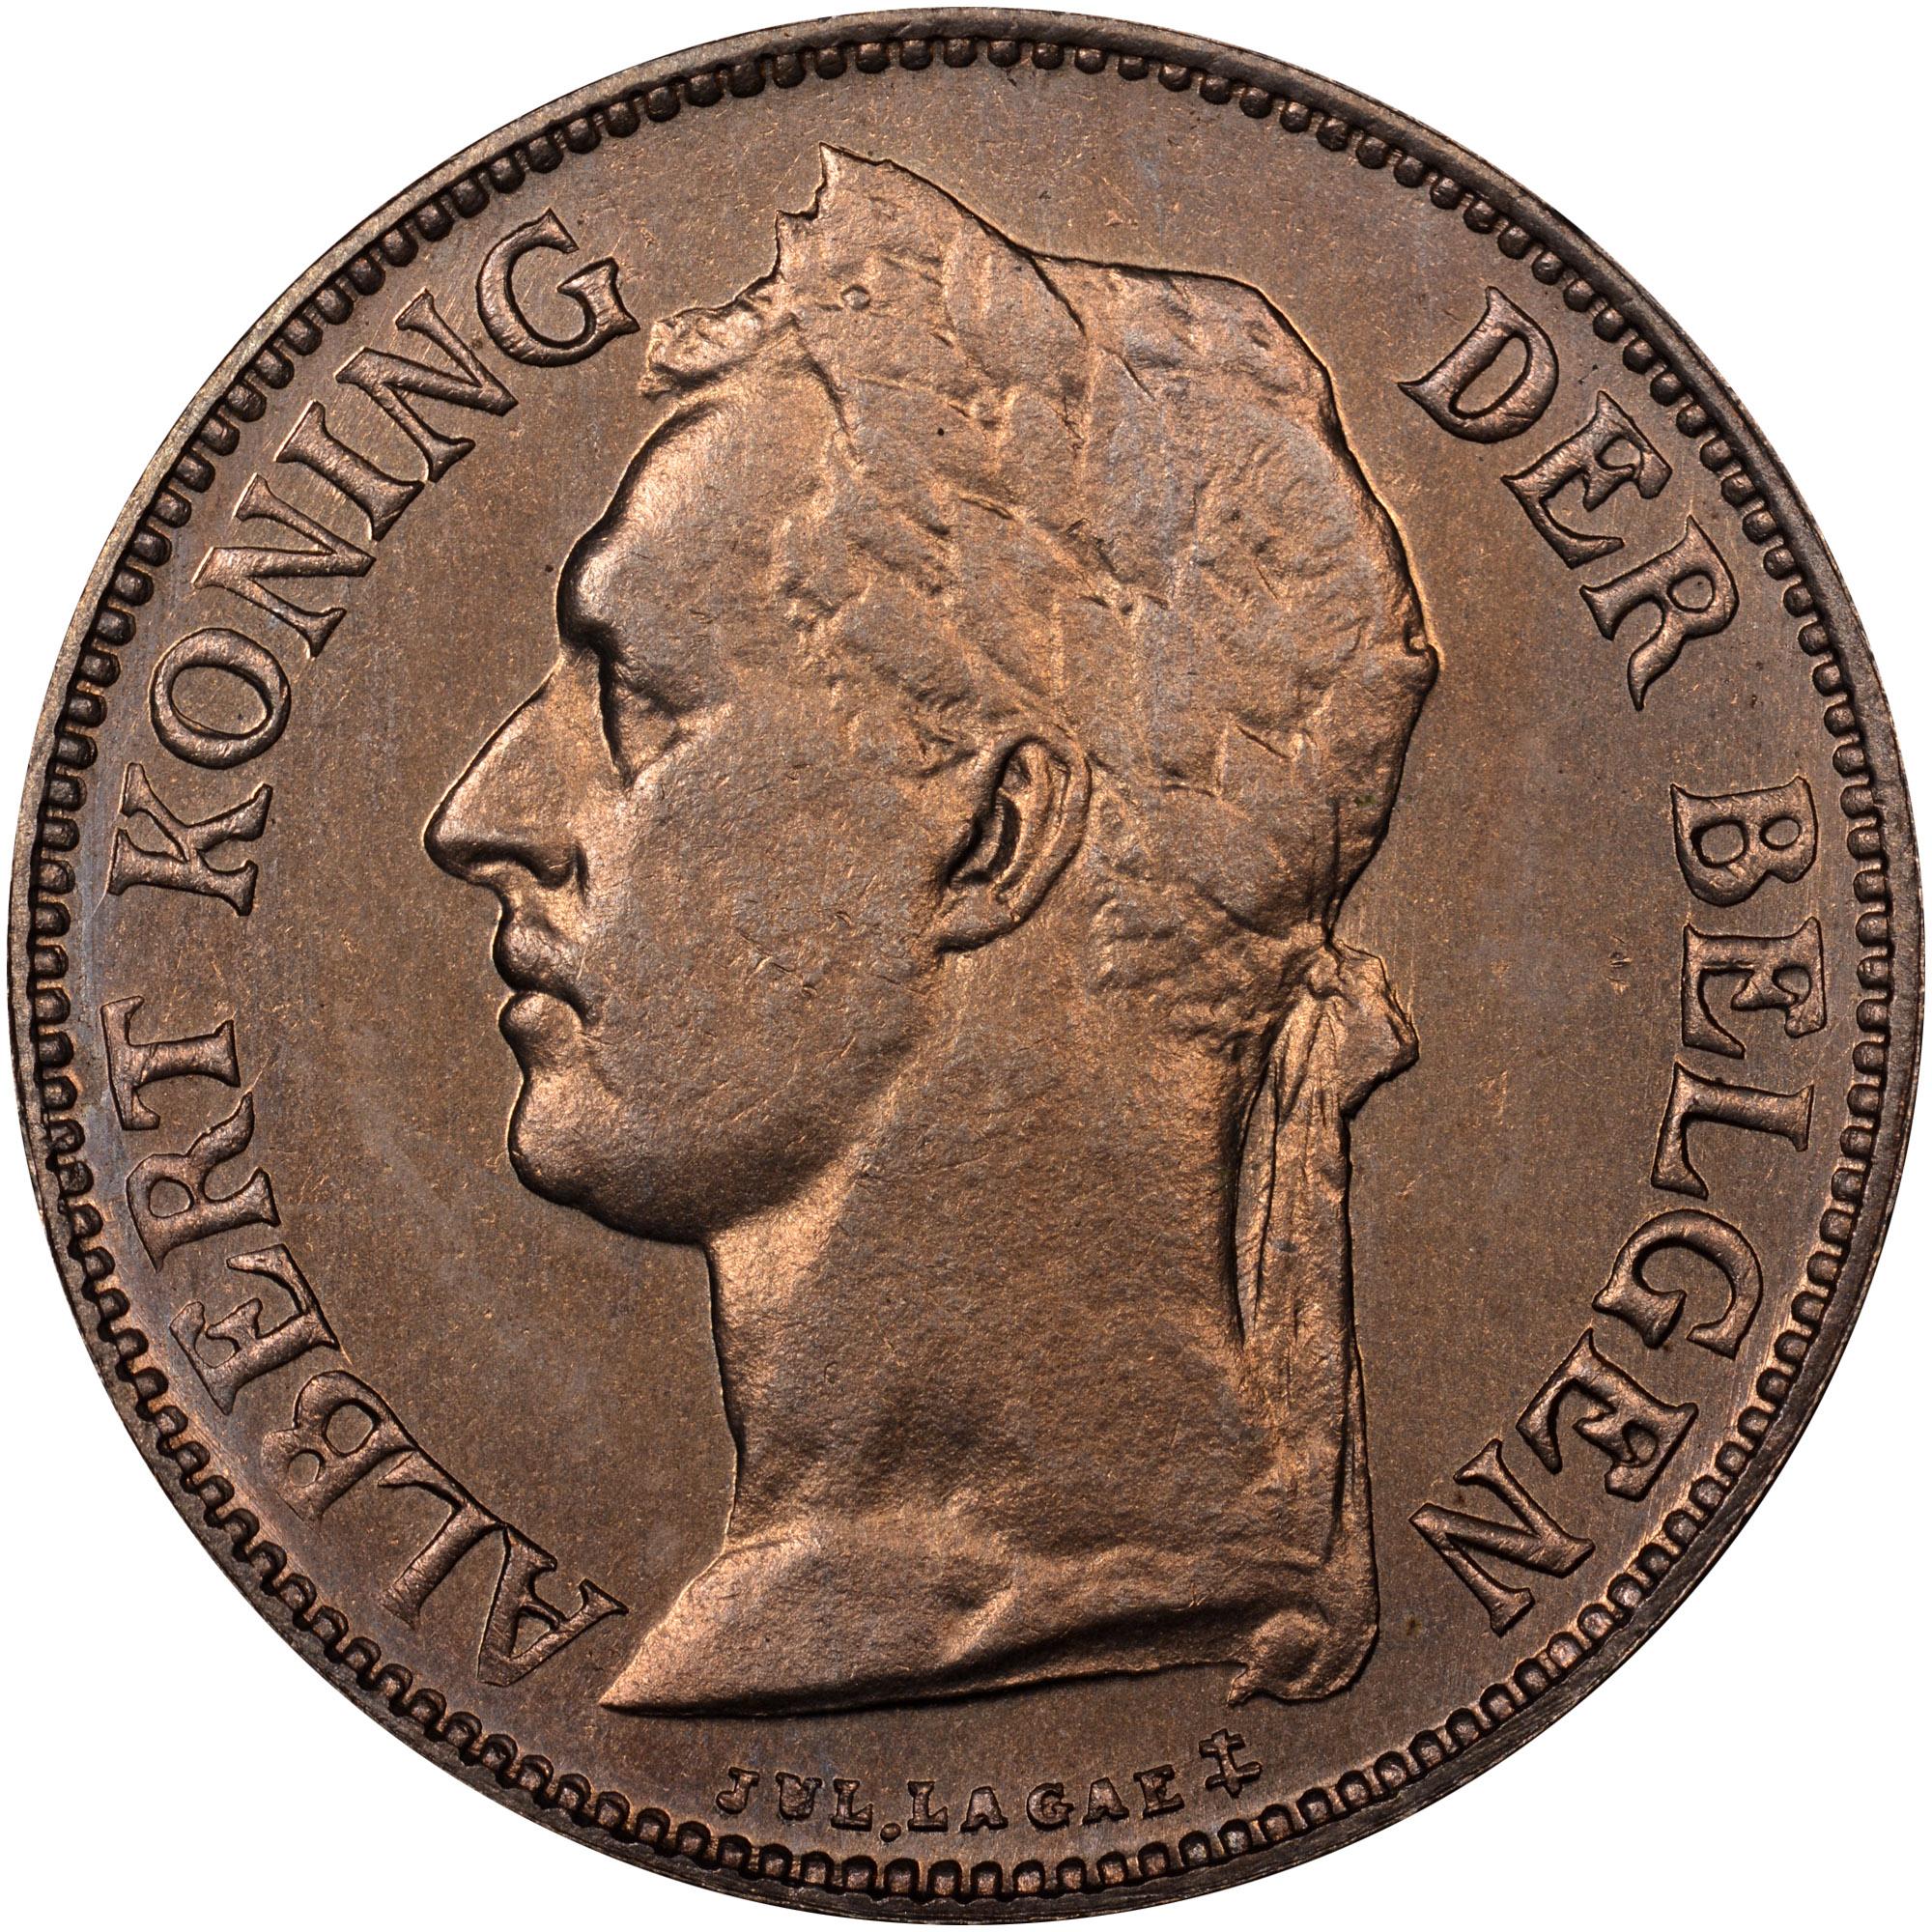 1921-1929/8 Belgian Congo 50 Centimes obverse